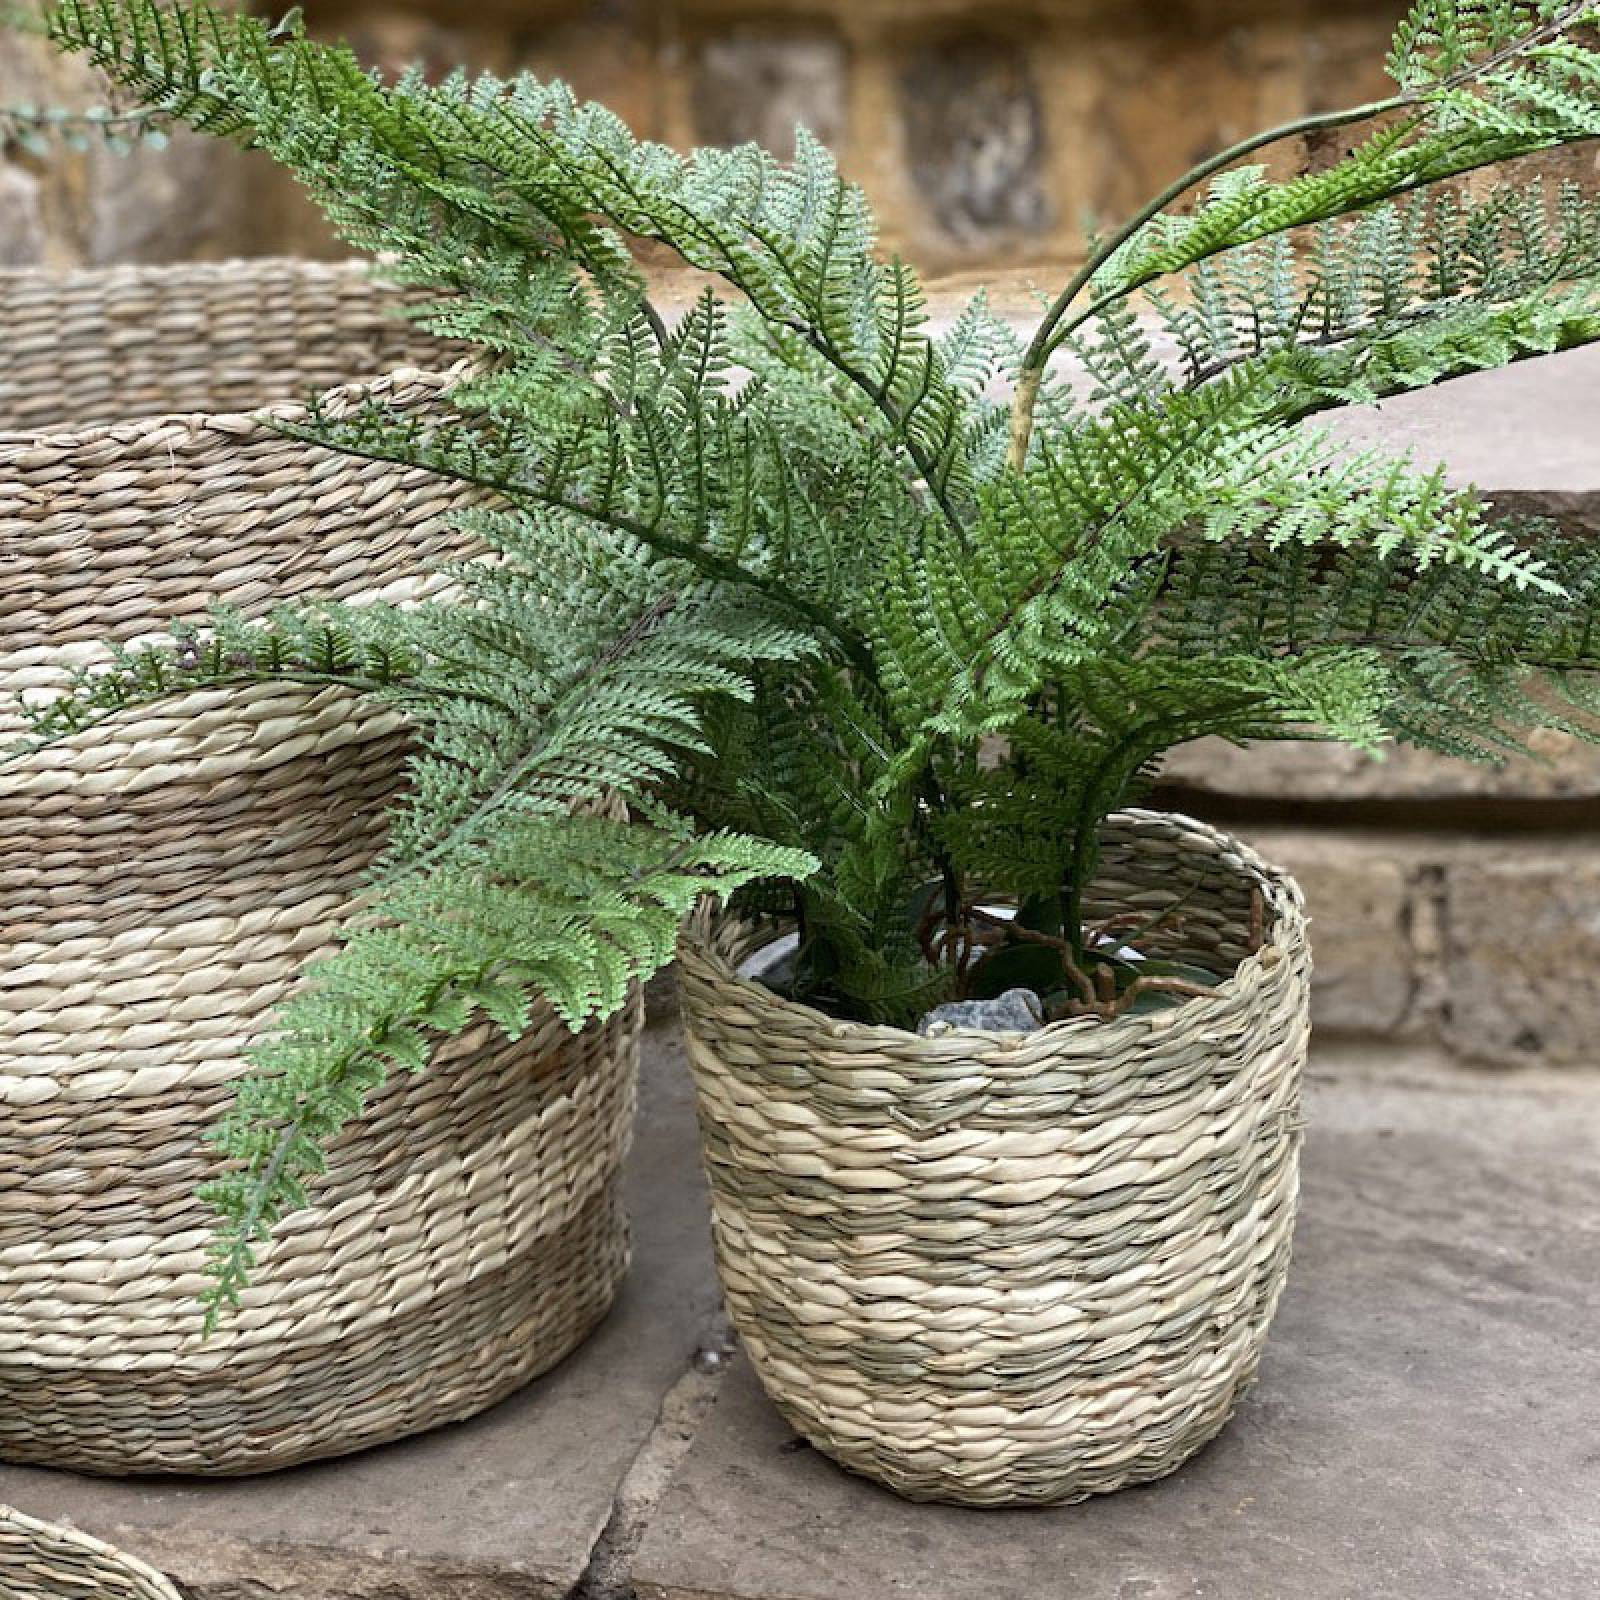 Small Striped Two Tone Striped Basket H:16cm